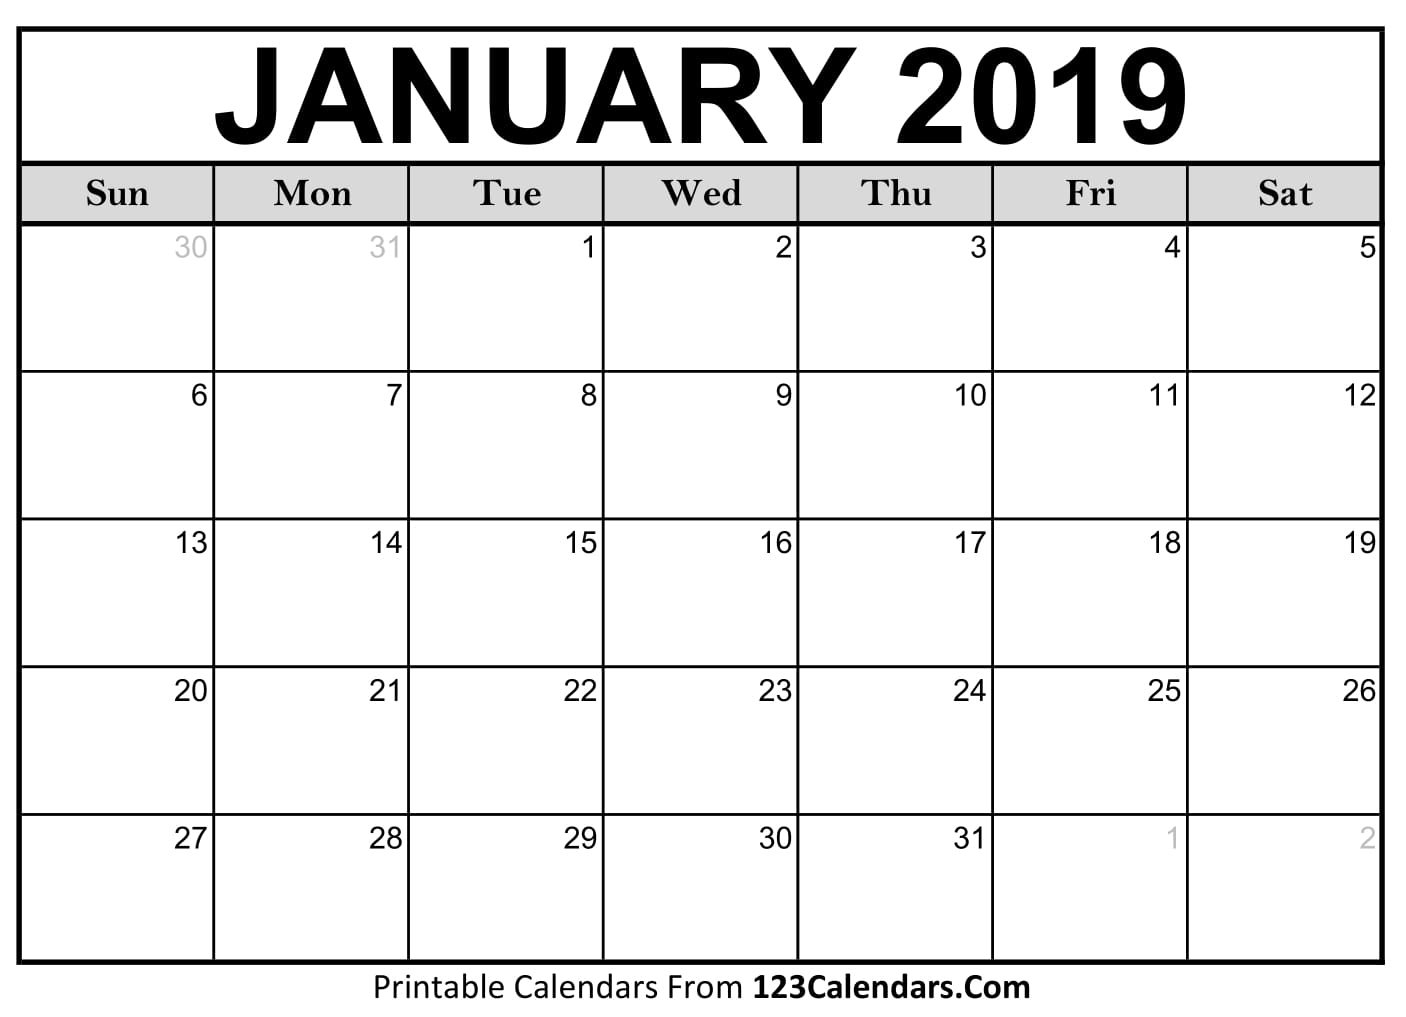 Free Printable Calendar | 123Calendars January 2019 Calendar 123Calendars